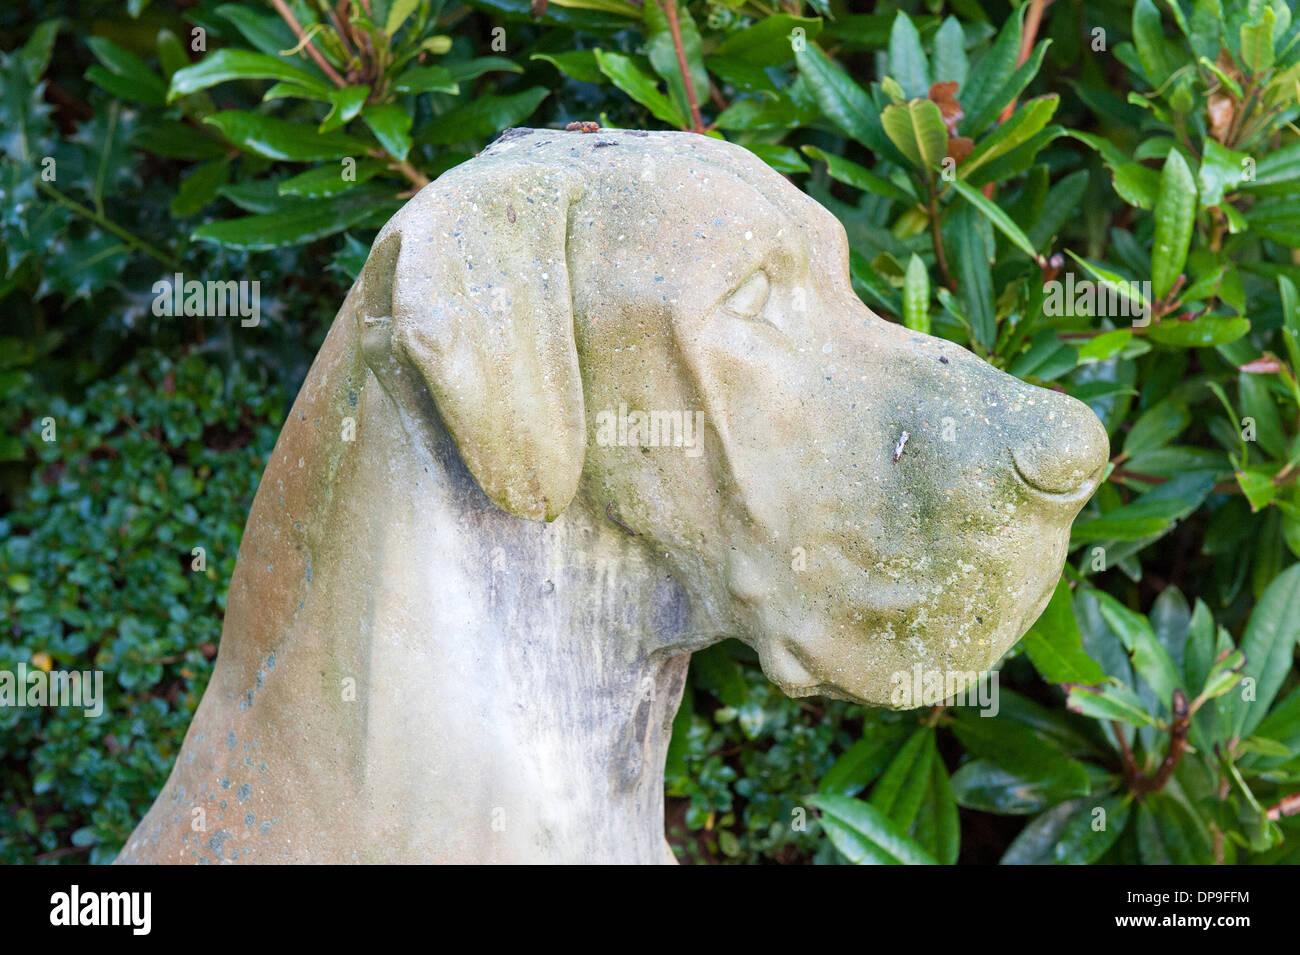 Stone statue of bloodhound large dog garden ornament stock photo stone statue of bloodhound large dog garden ornament workwithnaturefo